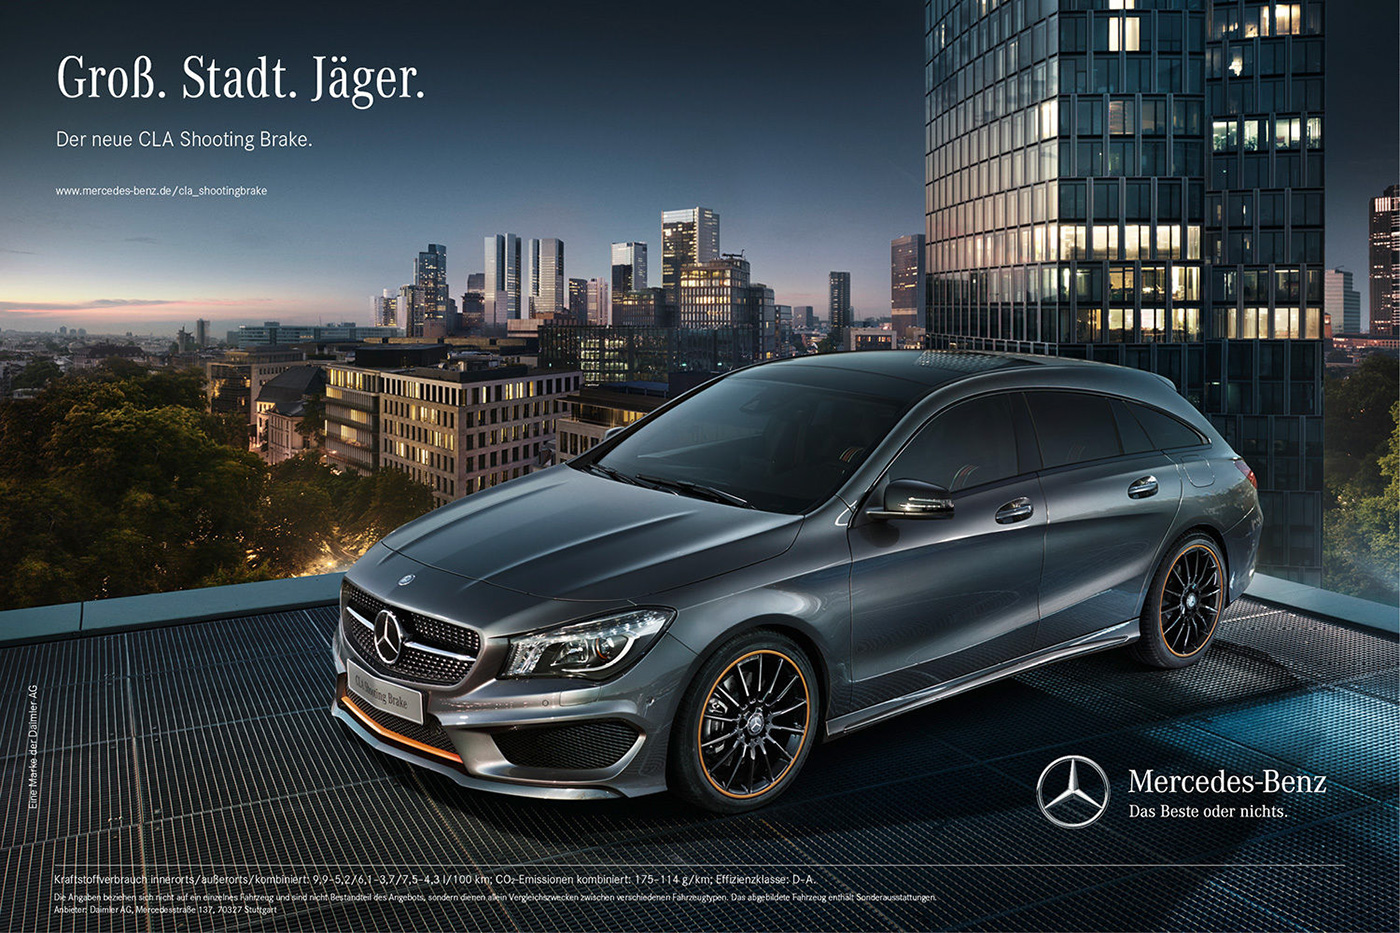 Mercedes Benz Cla >> Mercedes-Benz CLA with Anke Luckmann | CGI & Retouching on ...